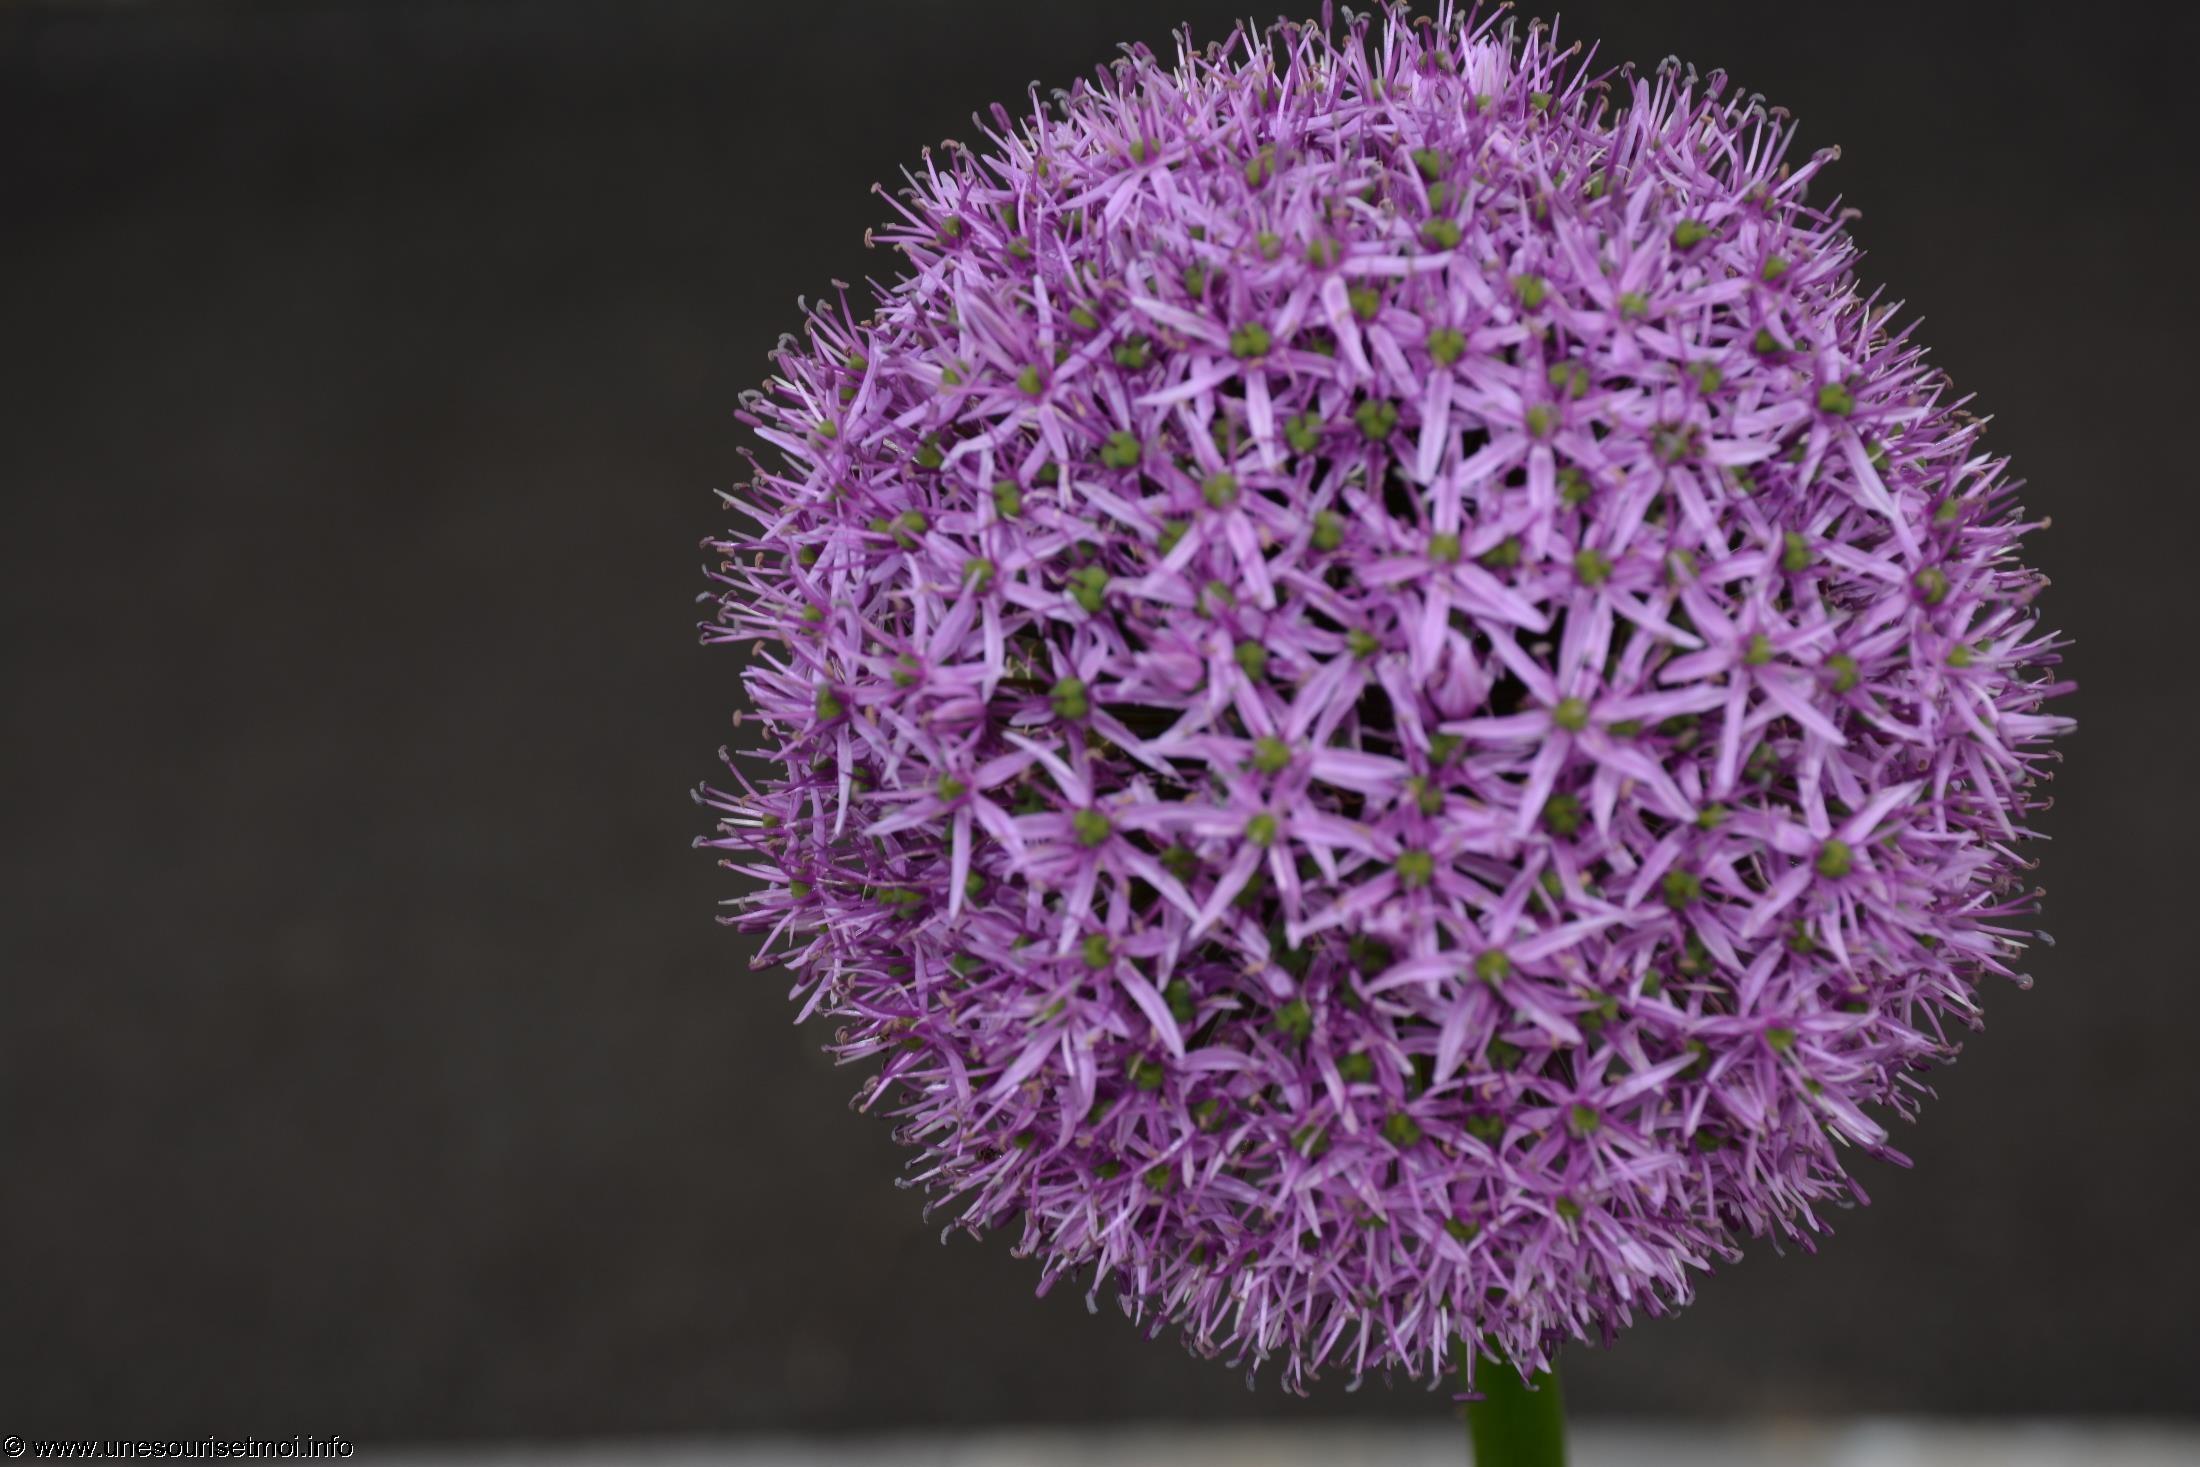 fleurs-ete-printemps-du-jardin-en-grand-format-HD_4